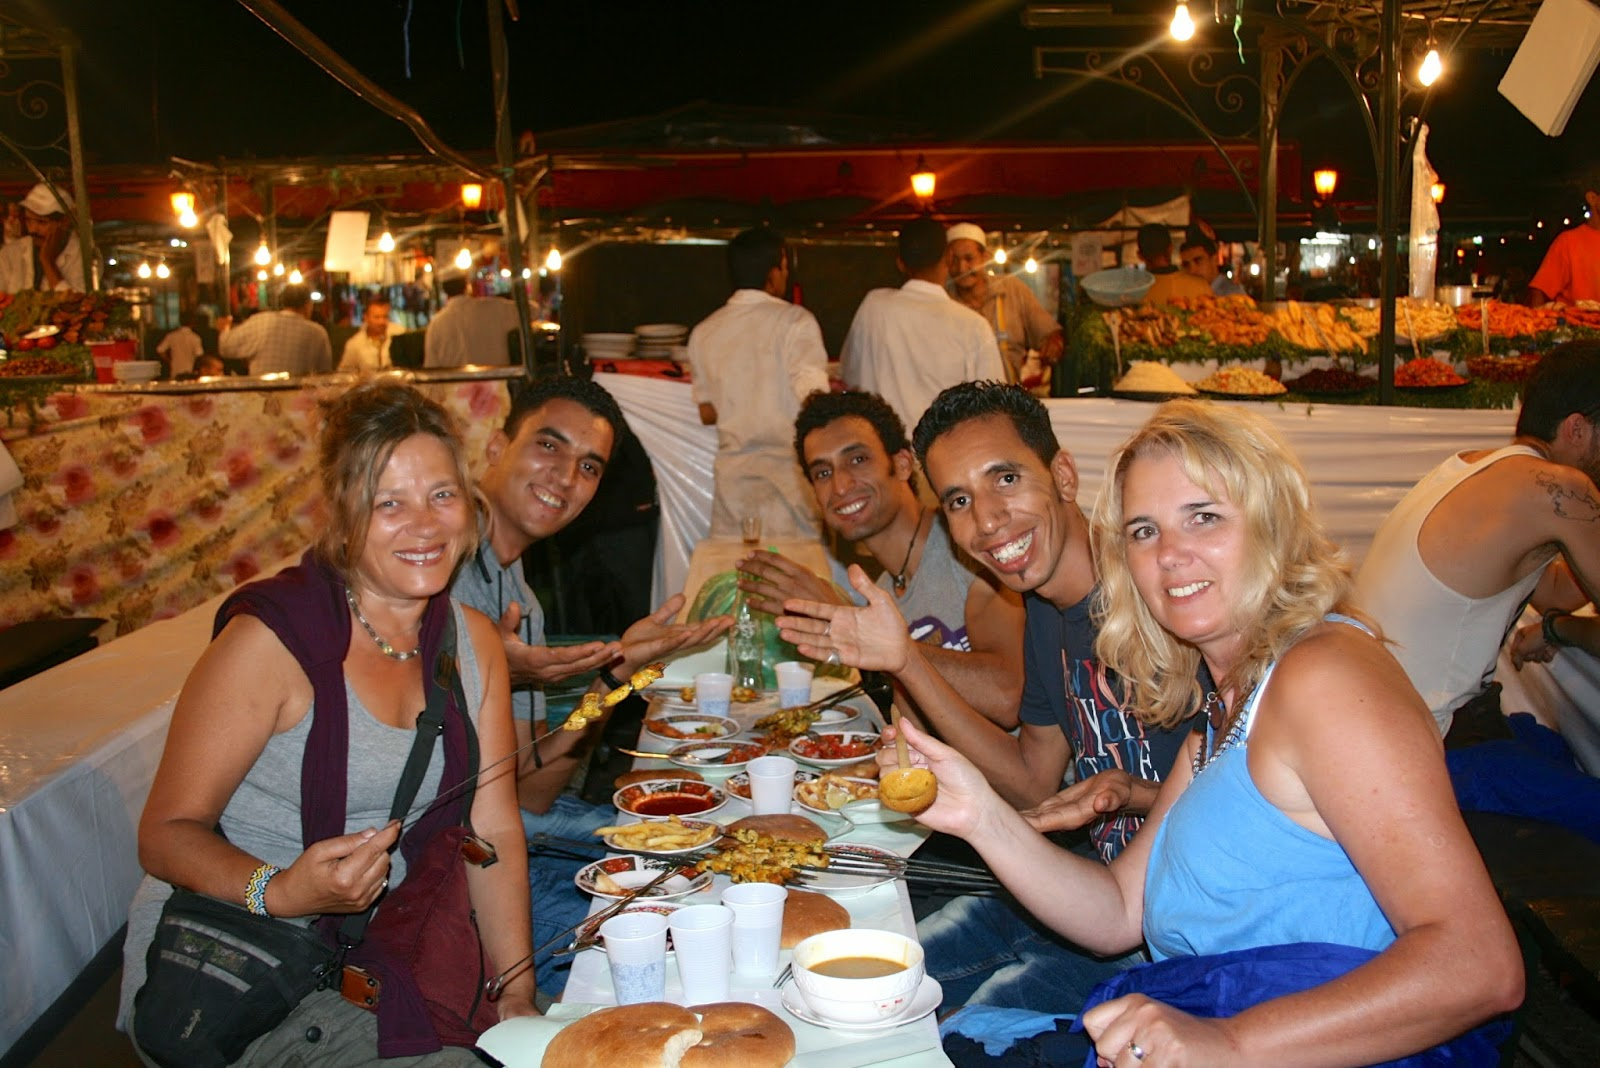 marrakech, viajes a marruecos, desierto de marruecos, vive marruecos